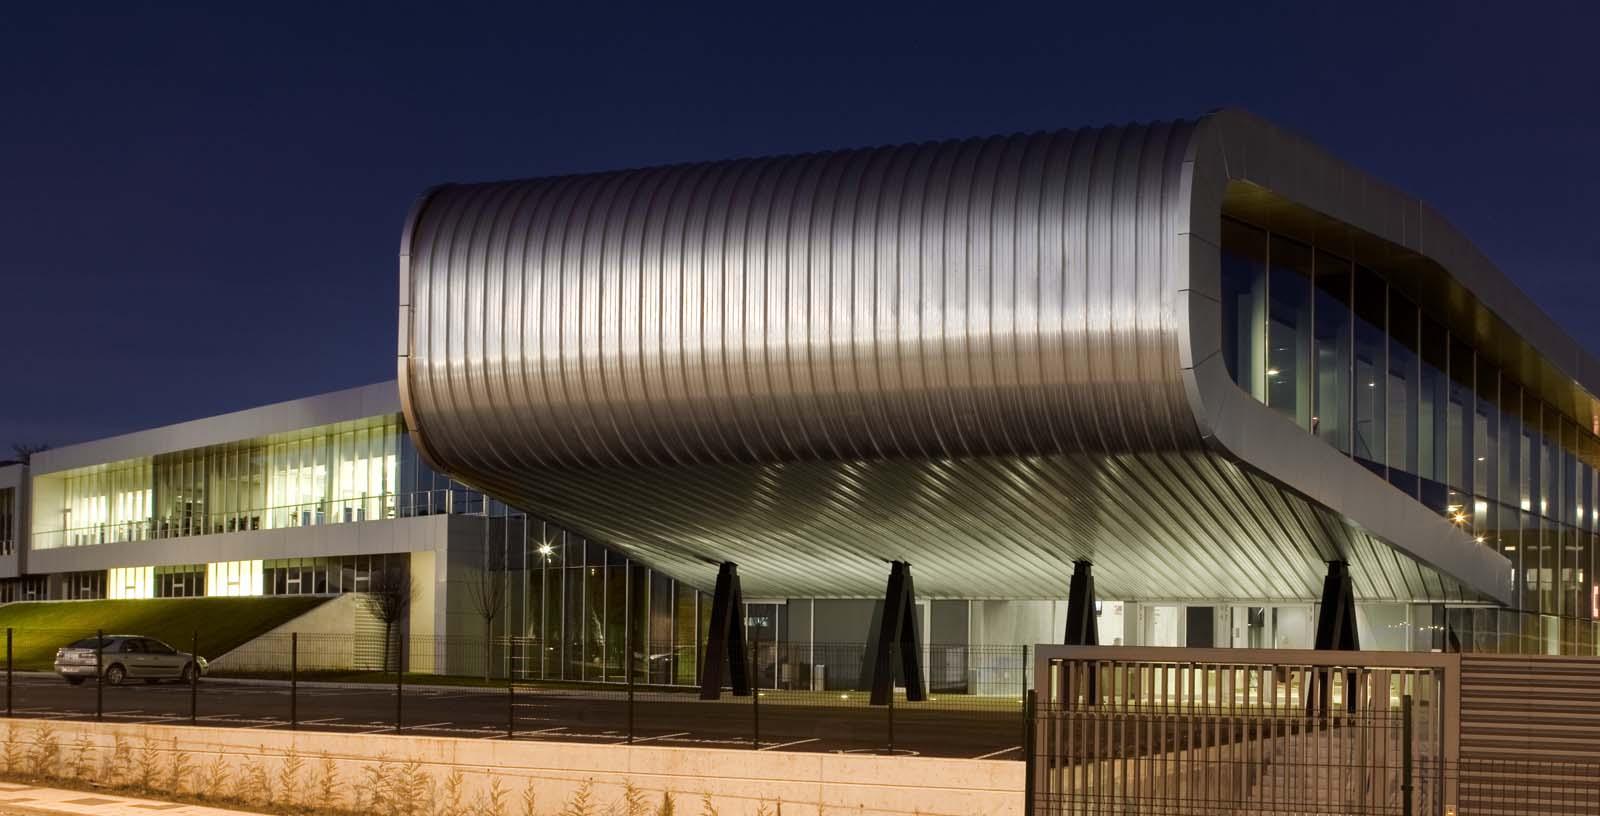 AIC_Automotive_Centre_02_Architecture_Idom_photos_Aitor_Ortiz